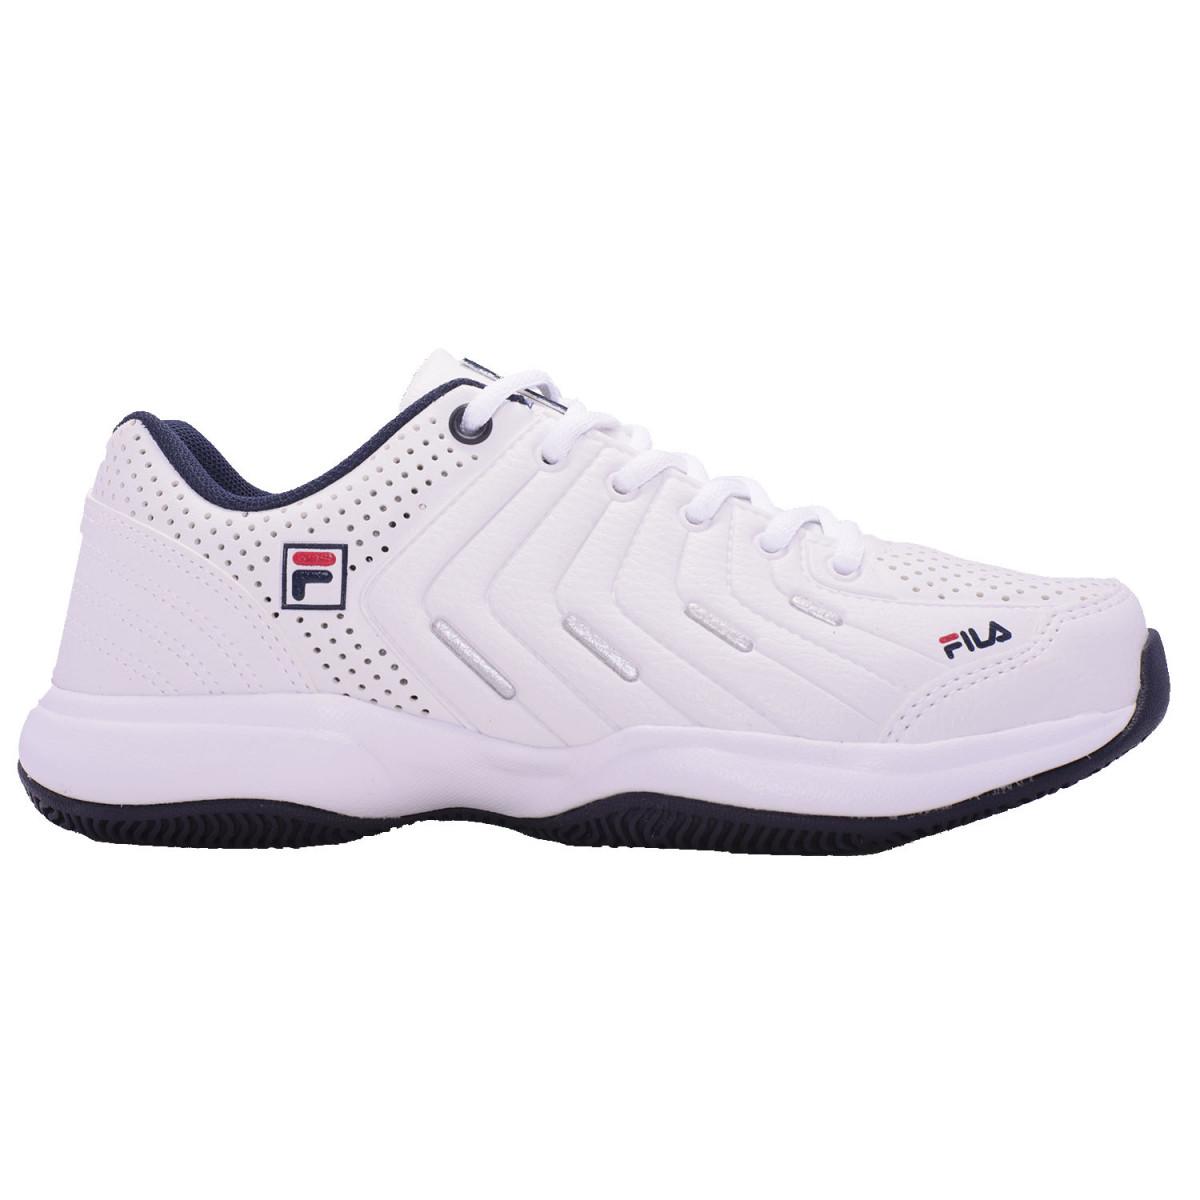 2033aa5a45 Zapatillas Fila Lugano 5.0 - Tenis - Disciplina